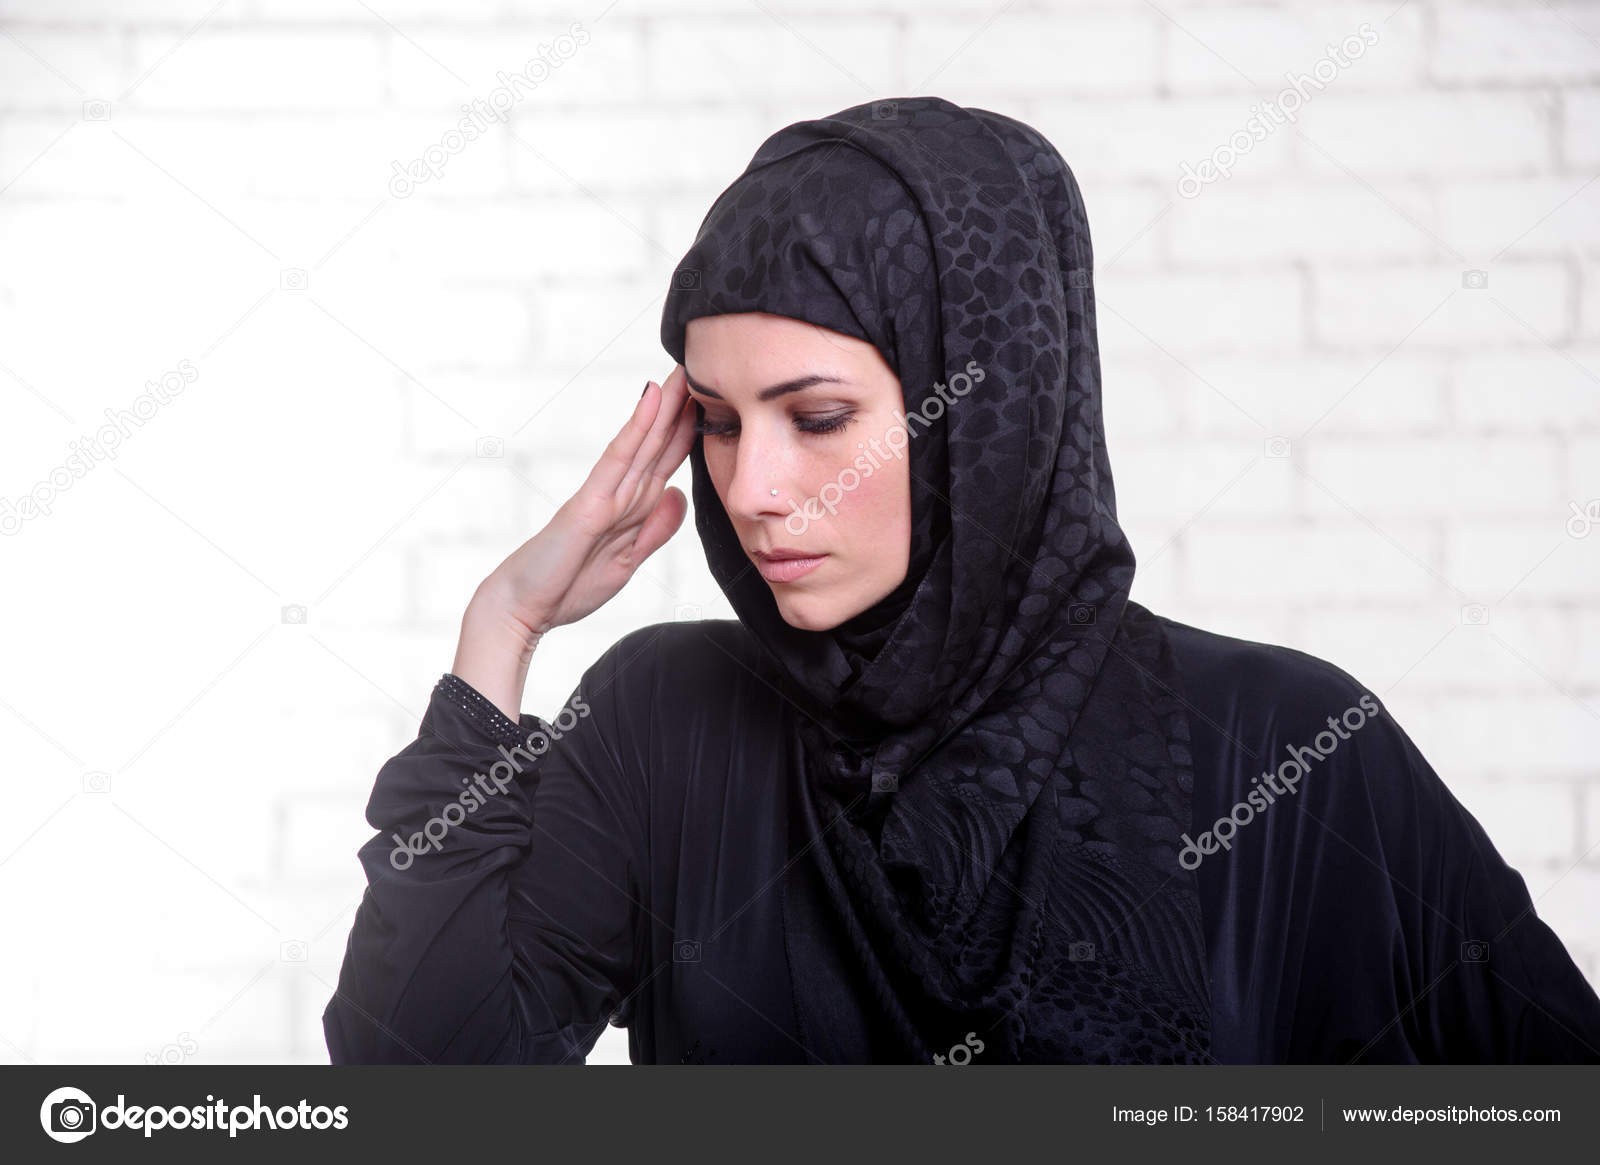 3861c34e9 Joven mujer árabe, vestida vestido árabe tradicional. — Foto de ...